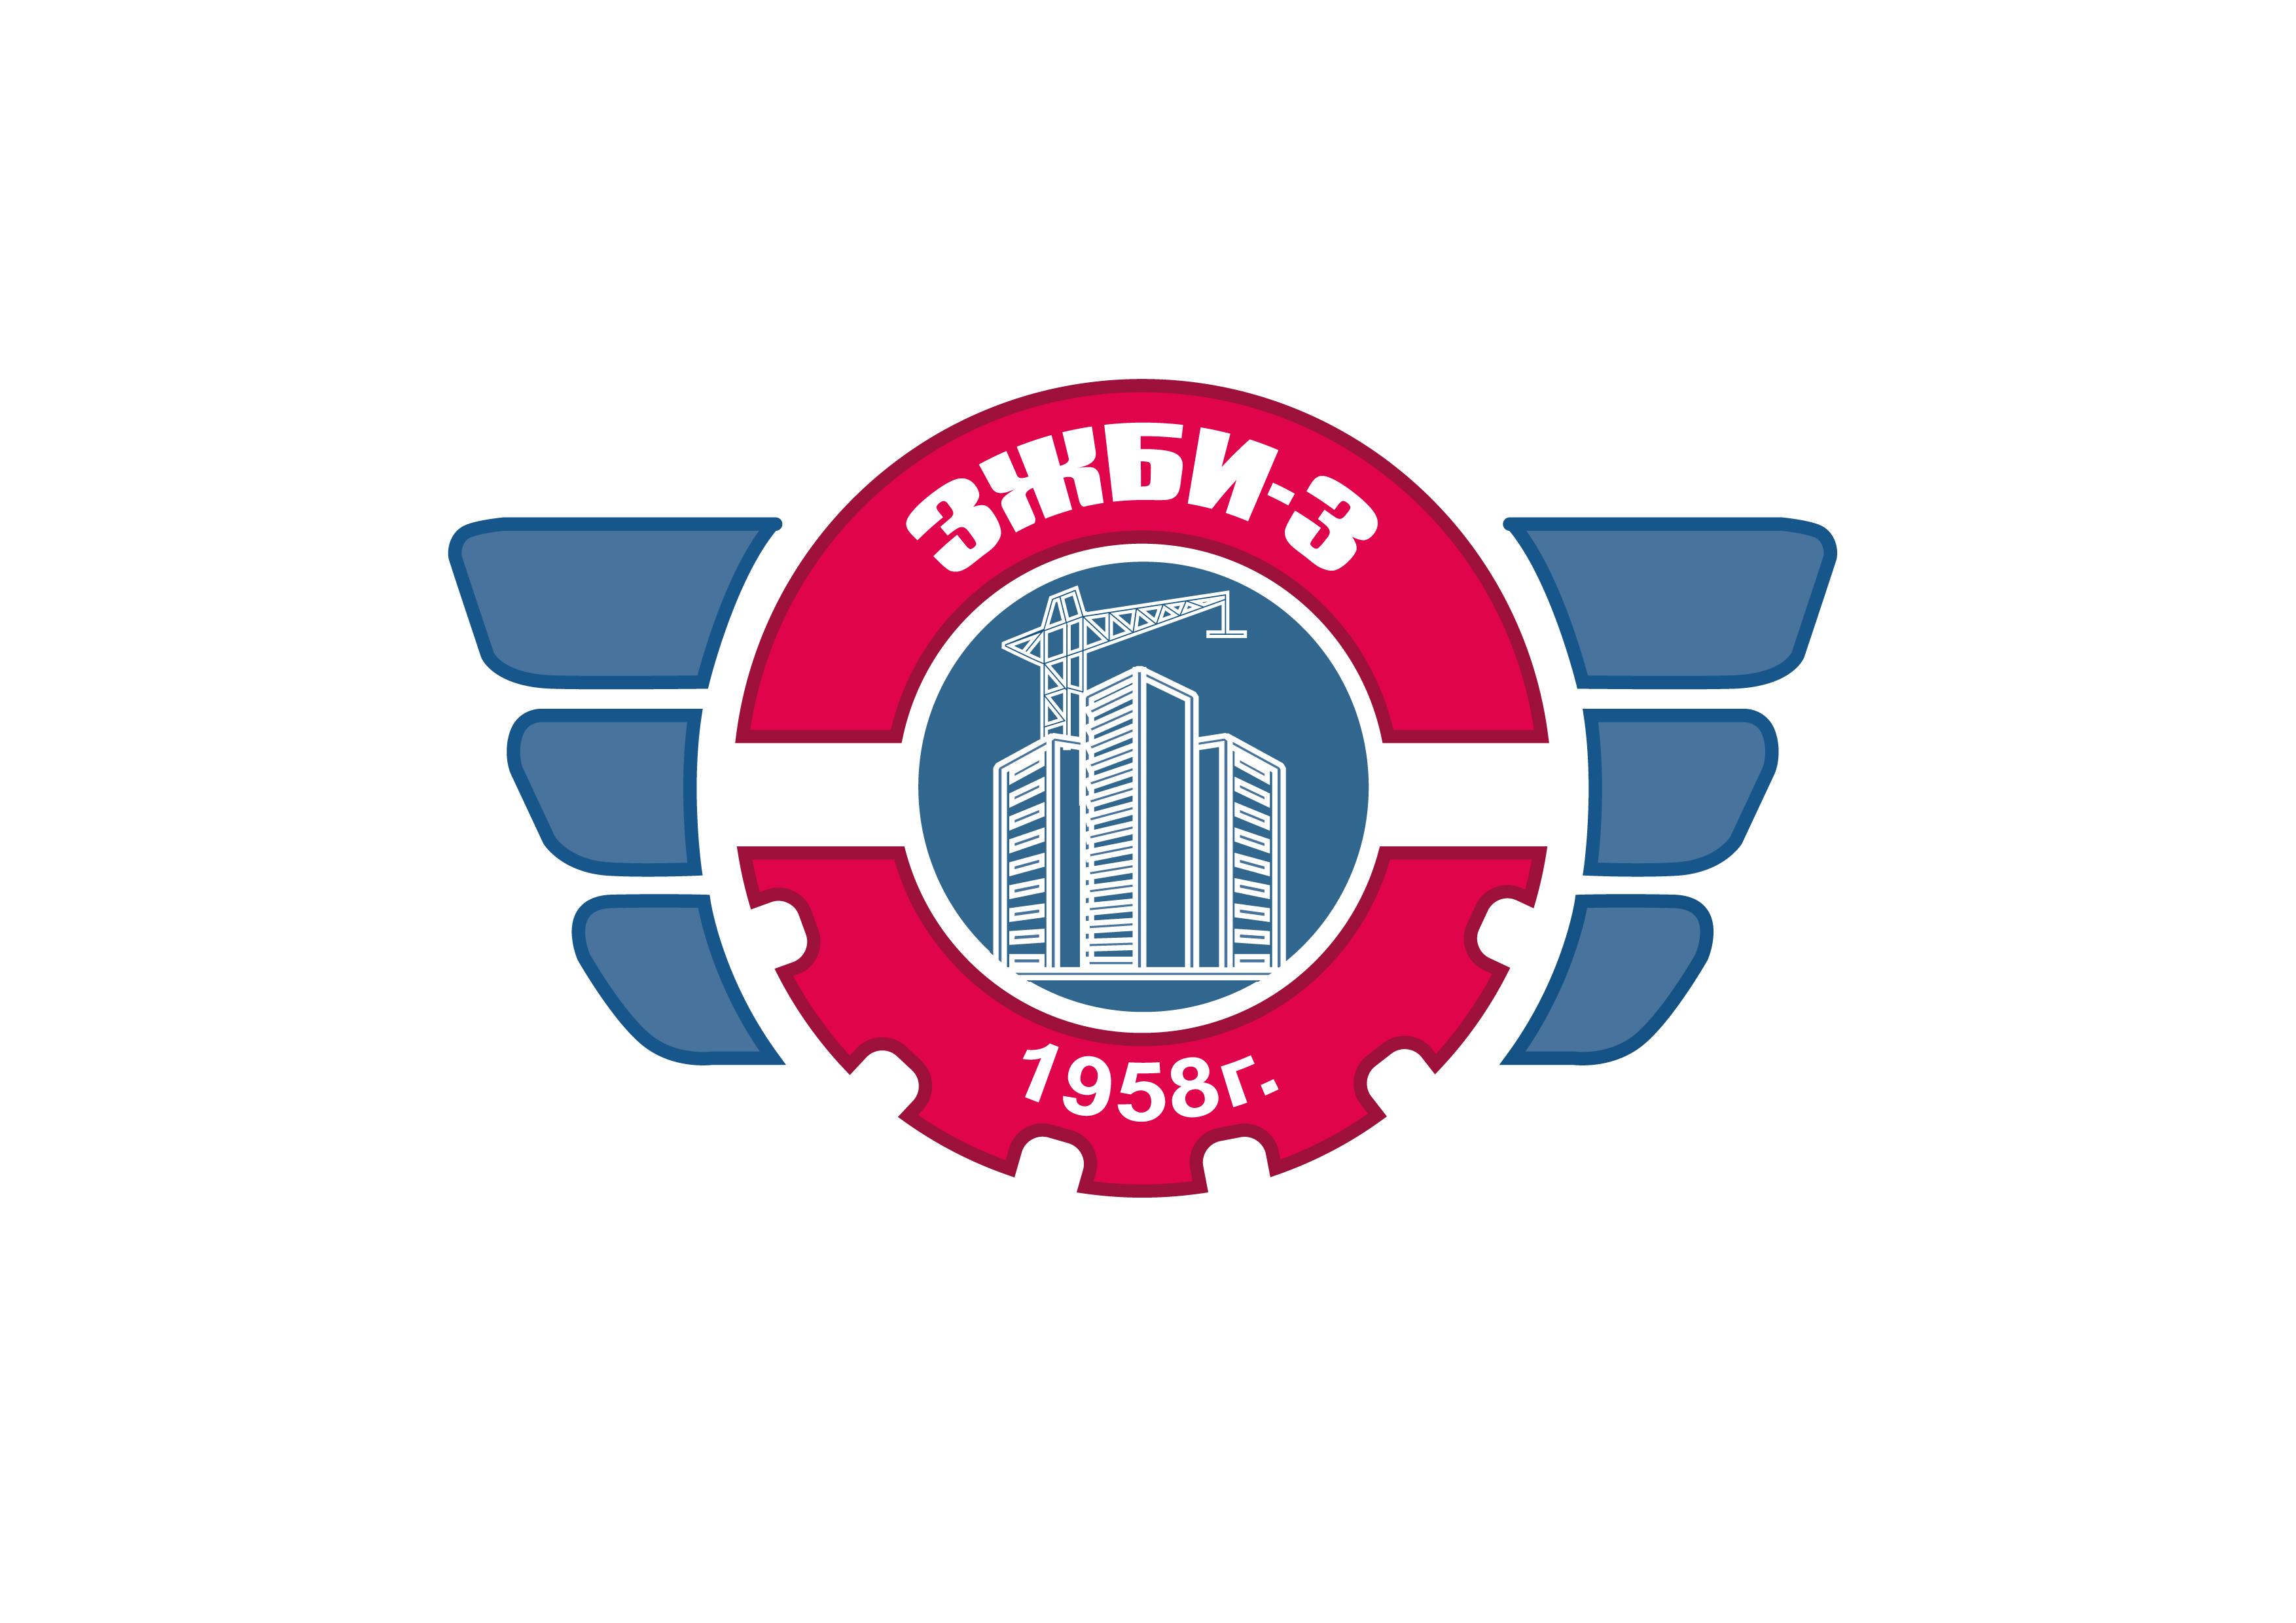 Разработка логотипа и фирменный стиль фото f_42559711977457f7.jpg